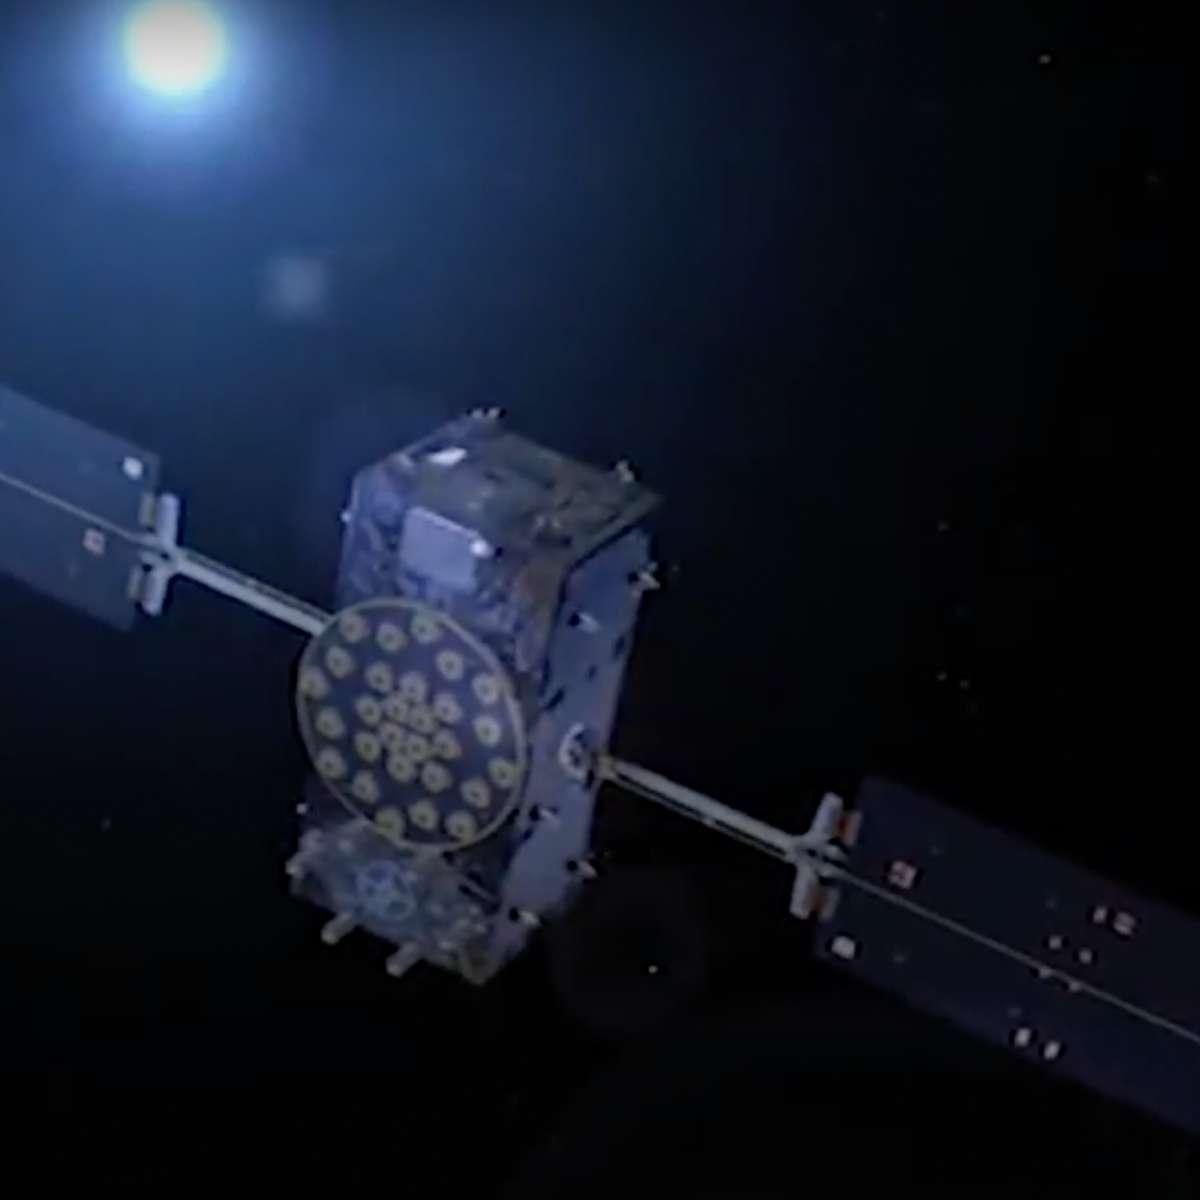 satellite2.png